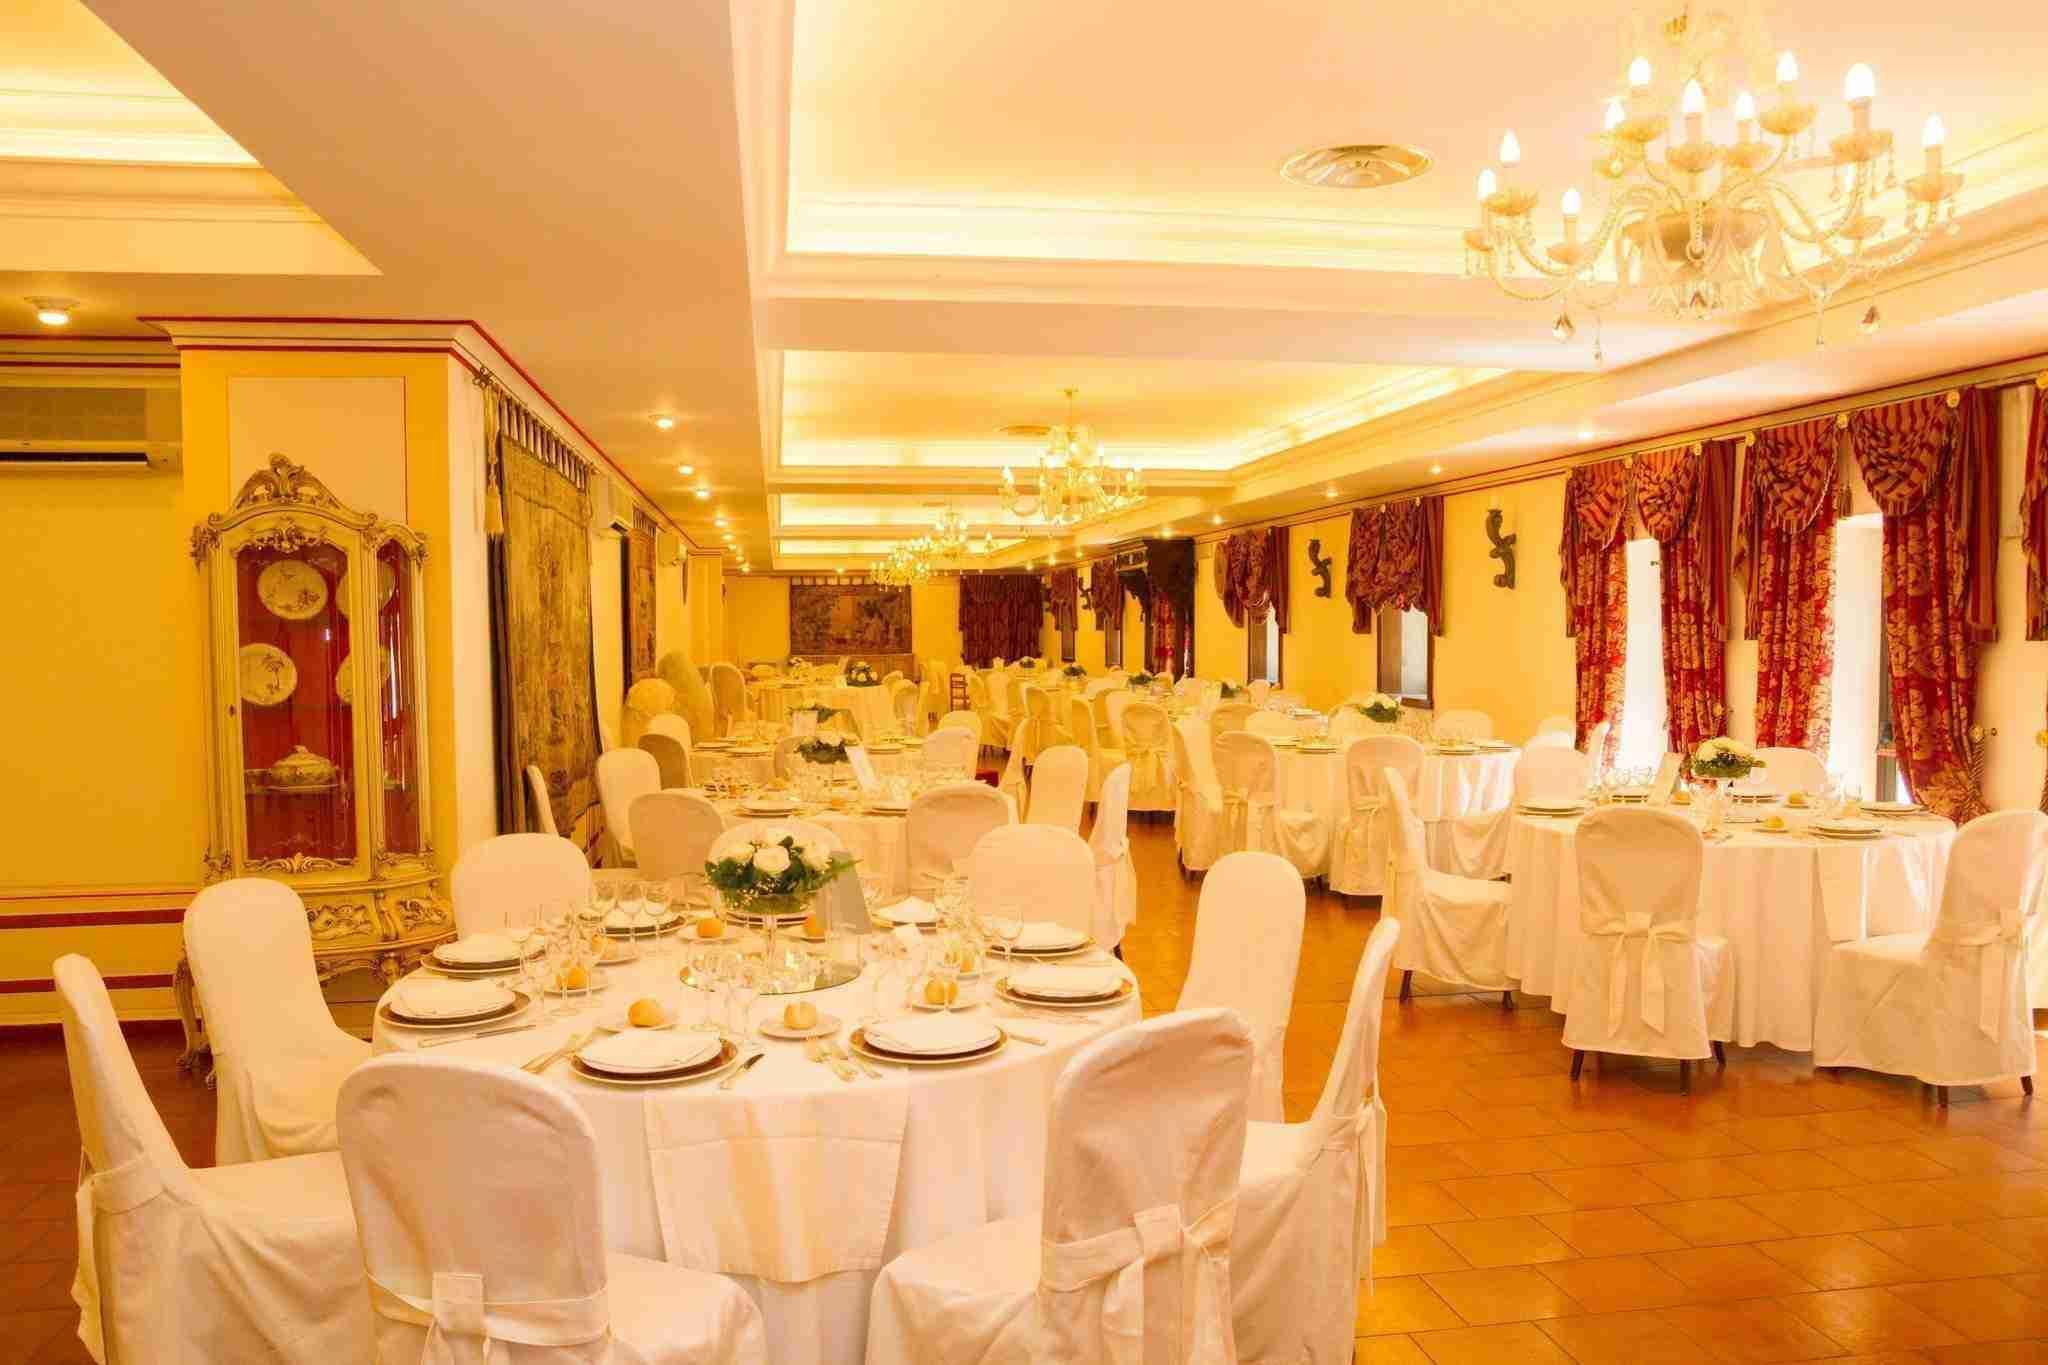 Villa per Matrimoni Cardinali - Sala Ricevimento